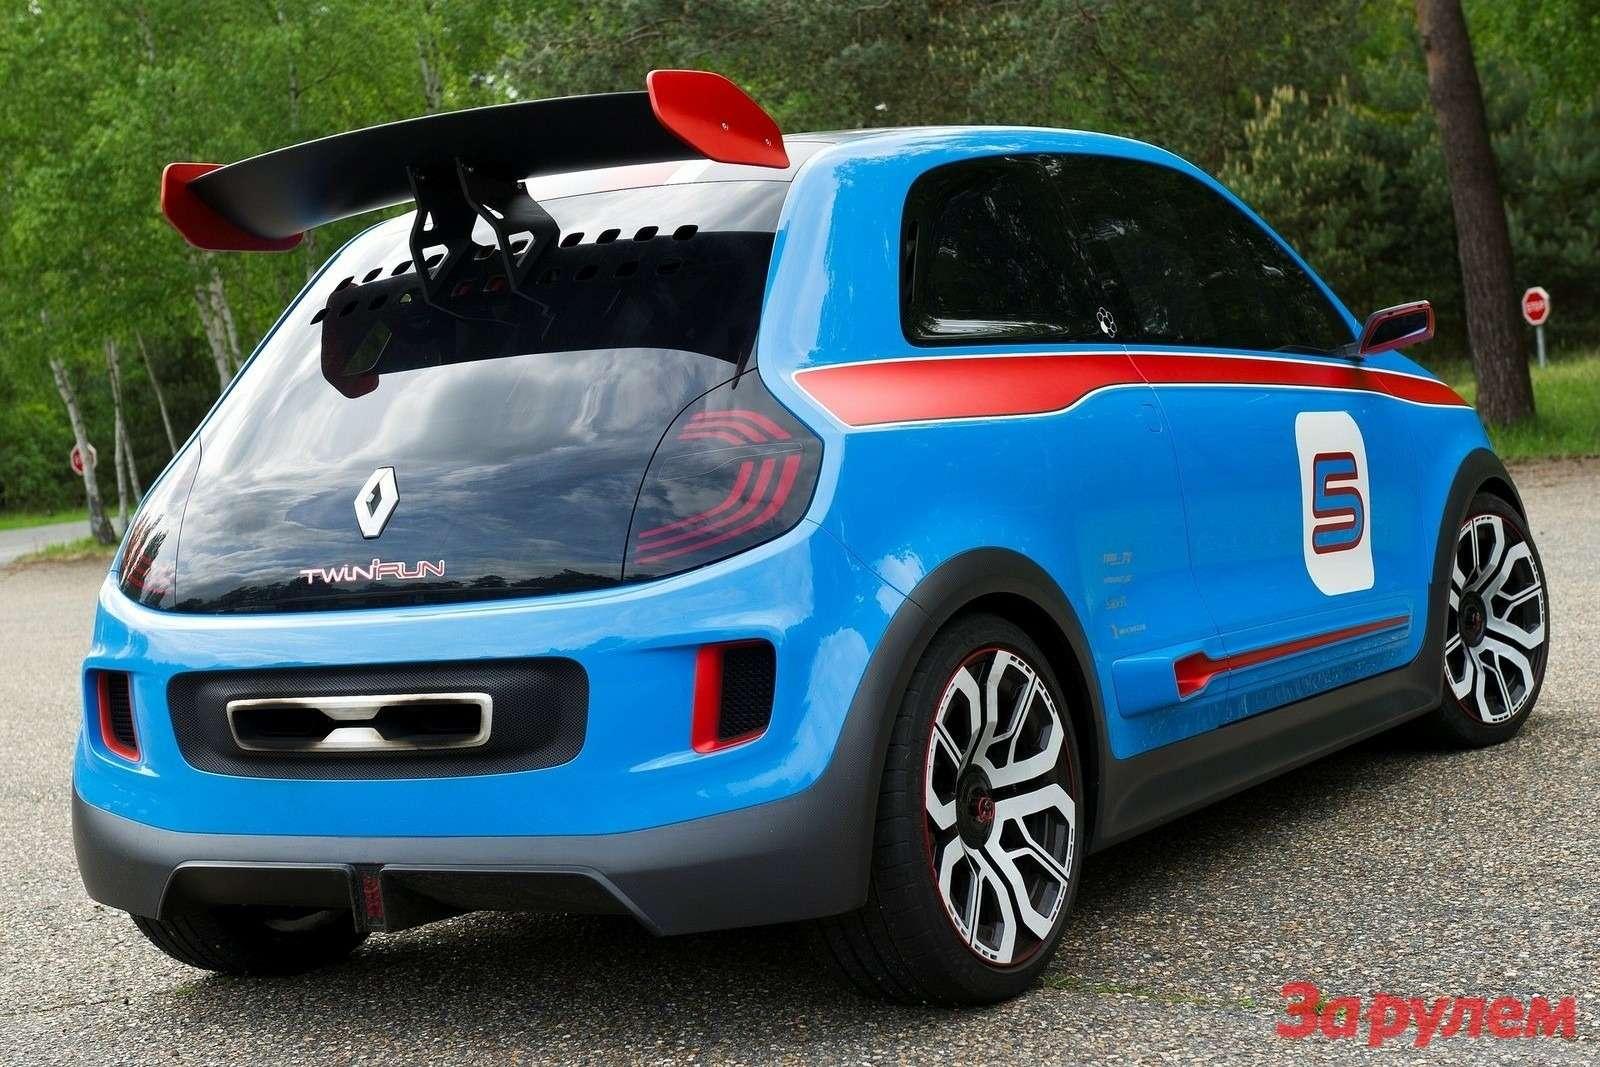 Renault Twin Run Concept 2013 1600x1200 wallpaper 0e